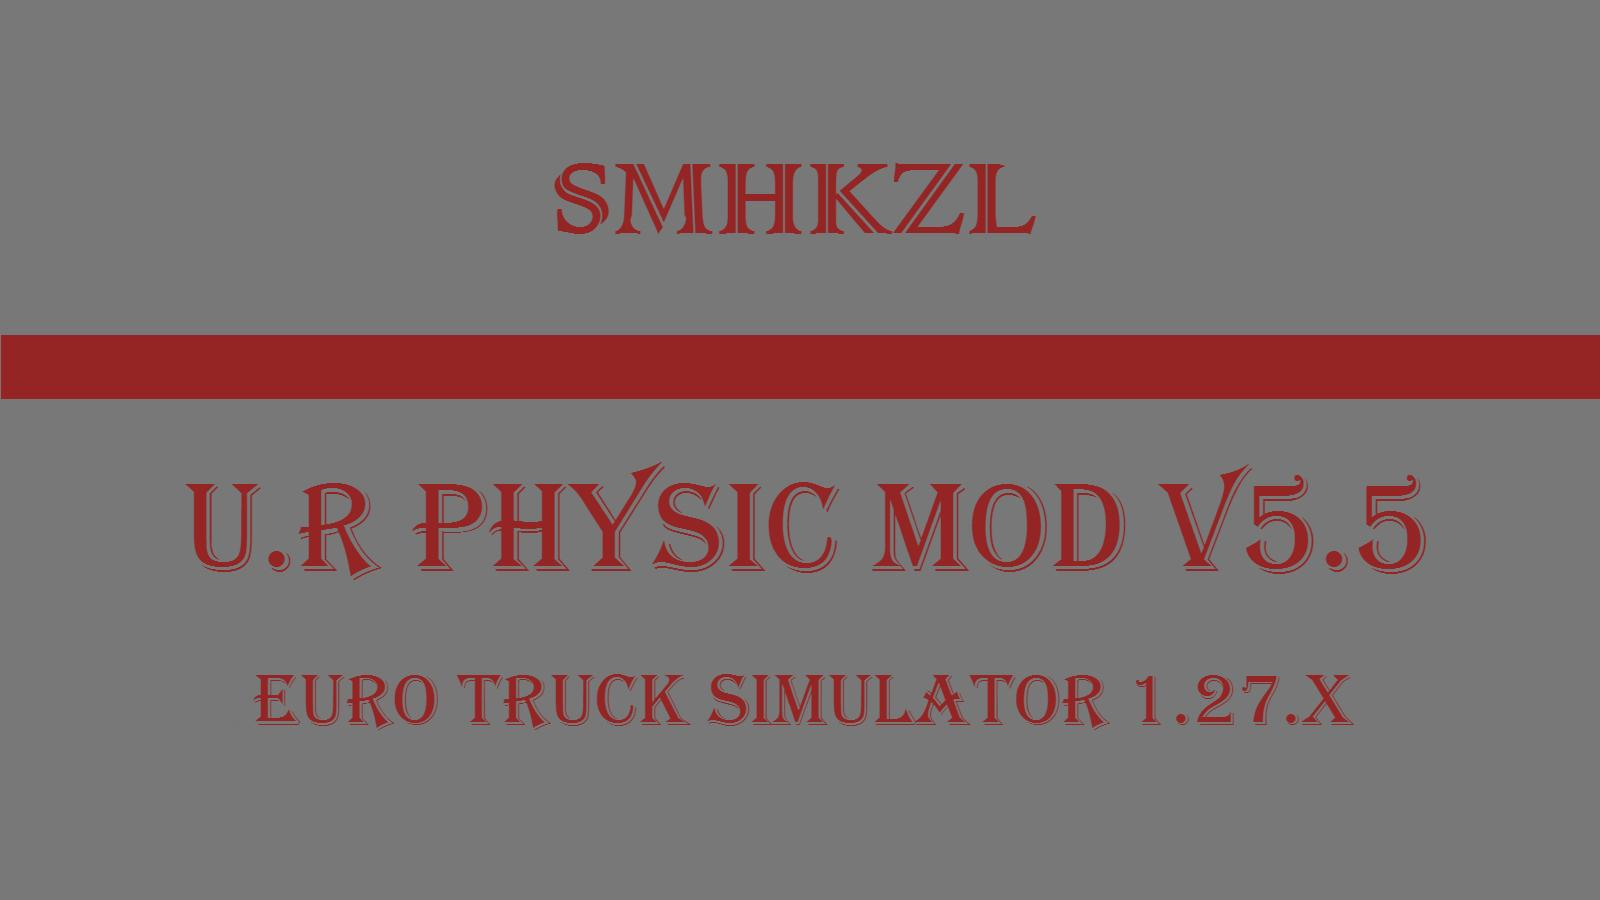 U.R PHYSIC MOD V5.5 SMHKZL 1.27.X